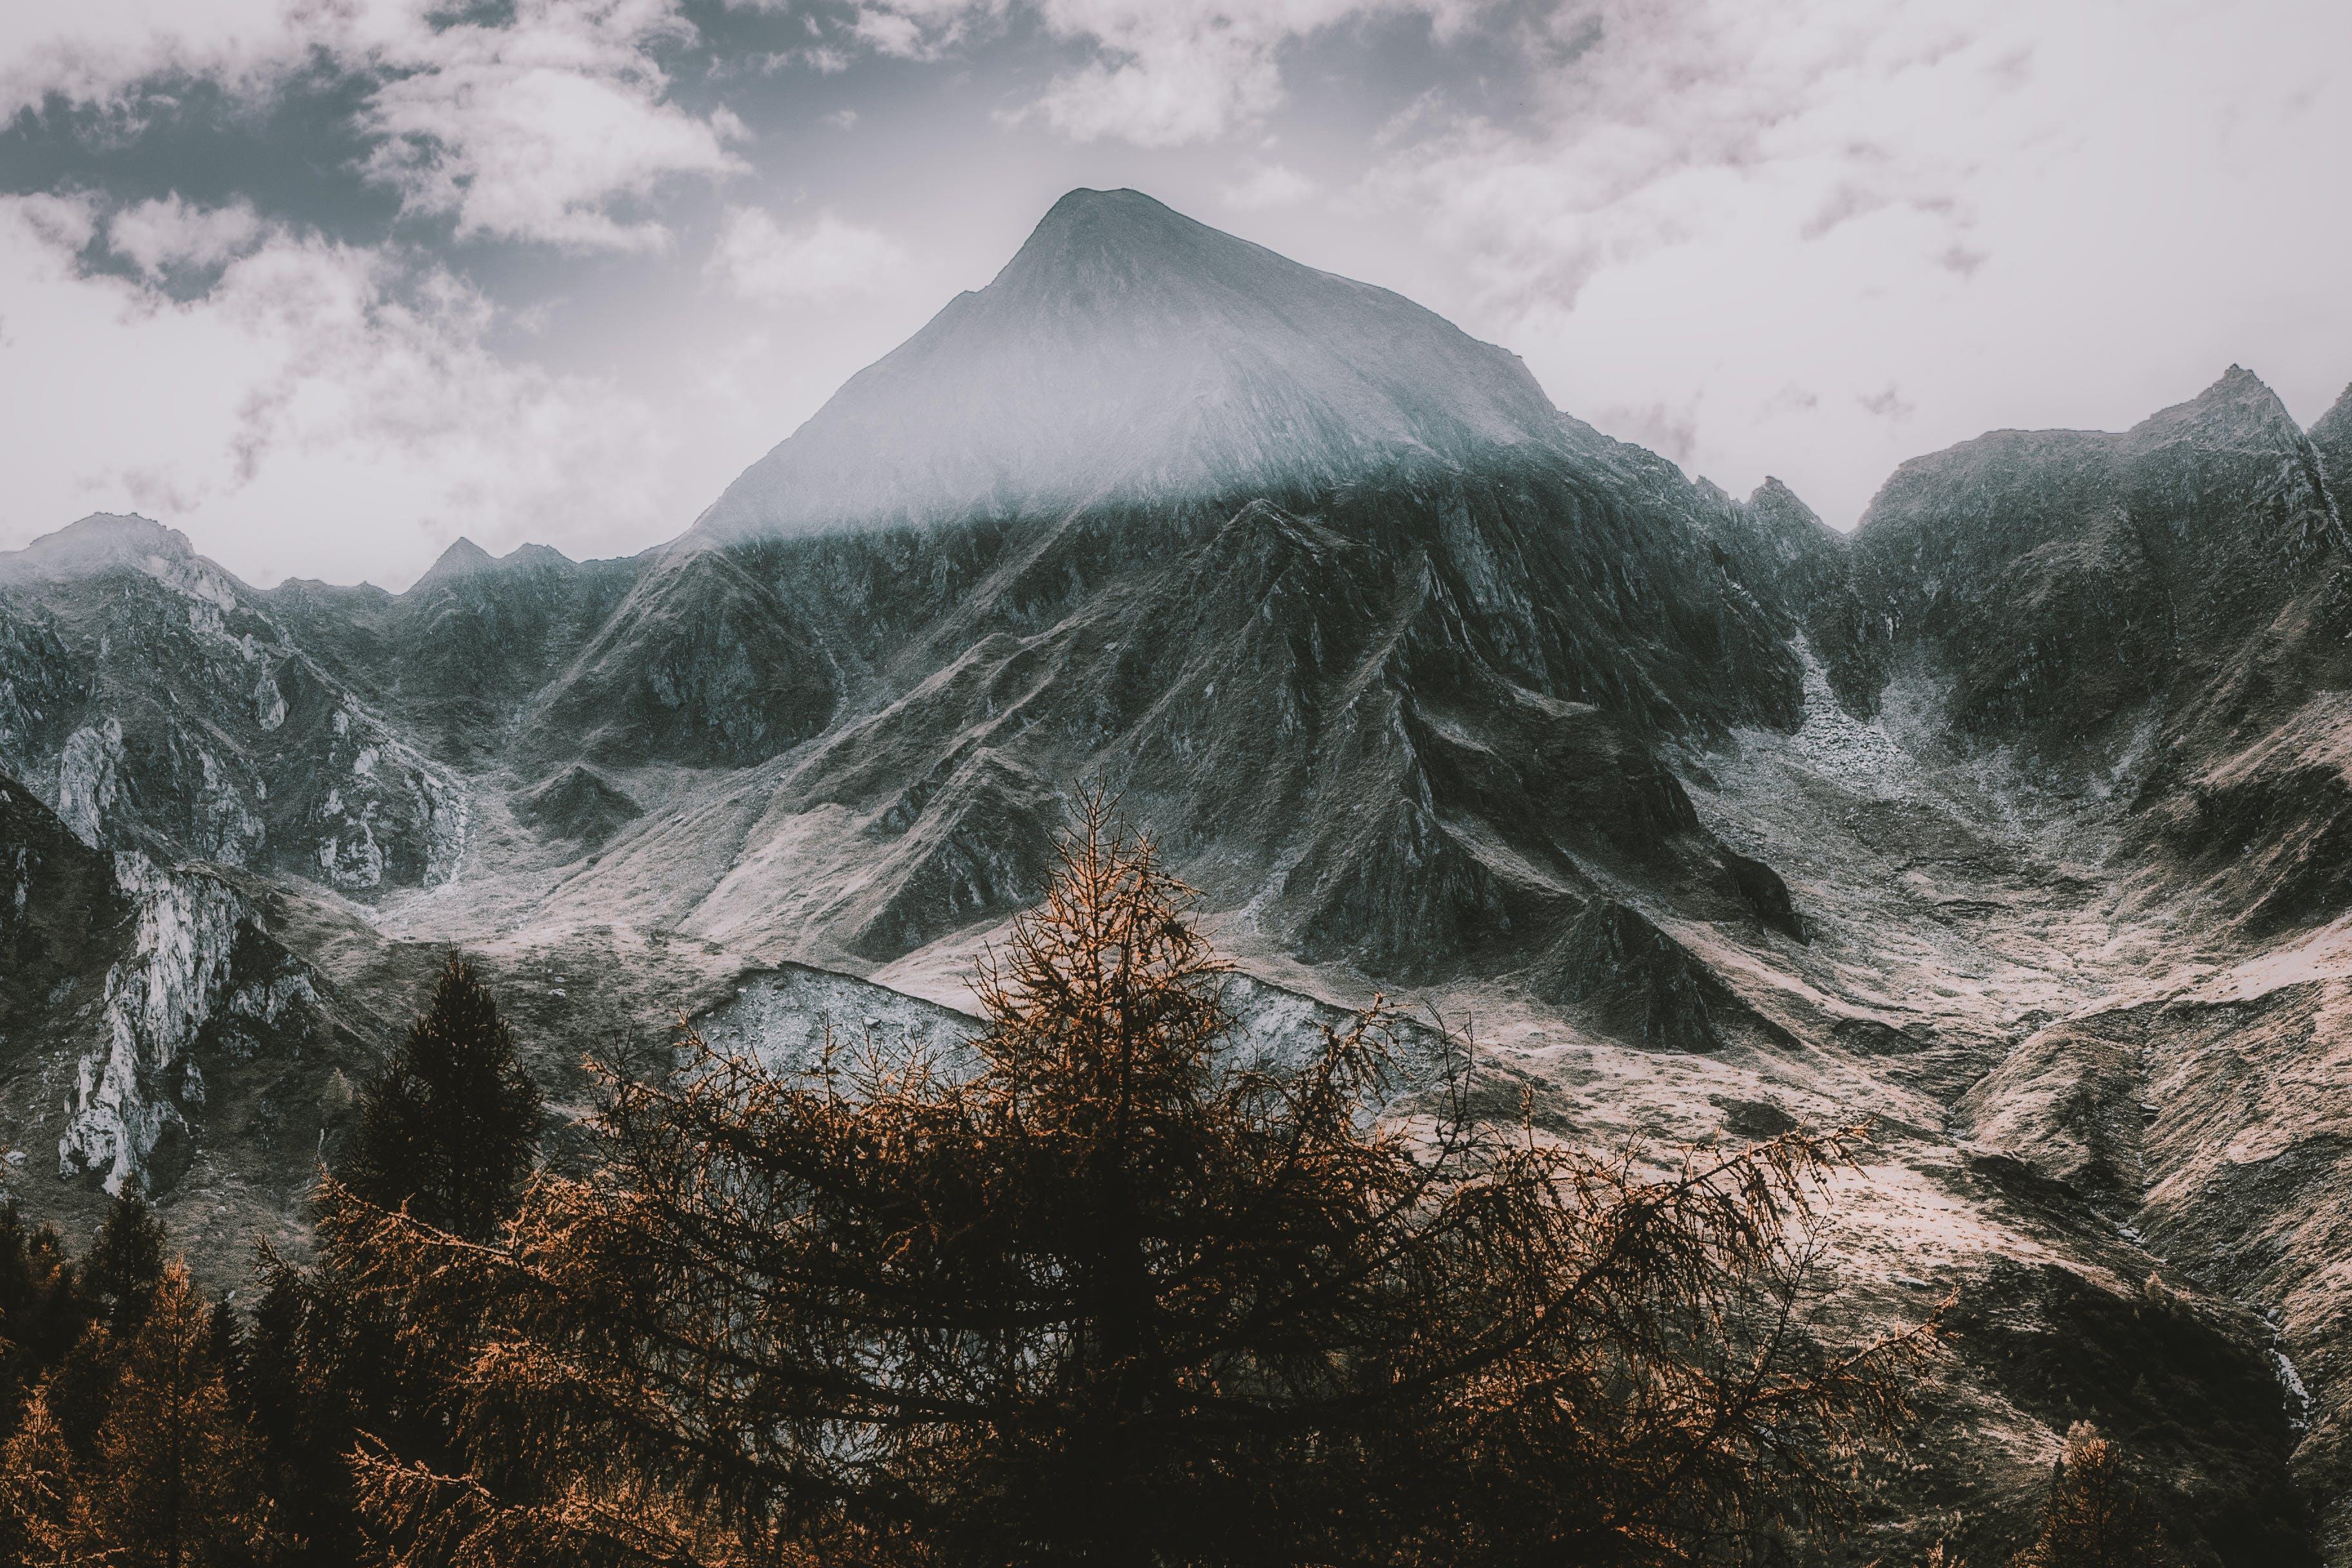 Kostnadsfri bild av bergen, bergstopp, dagsljus, himmel